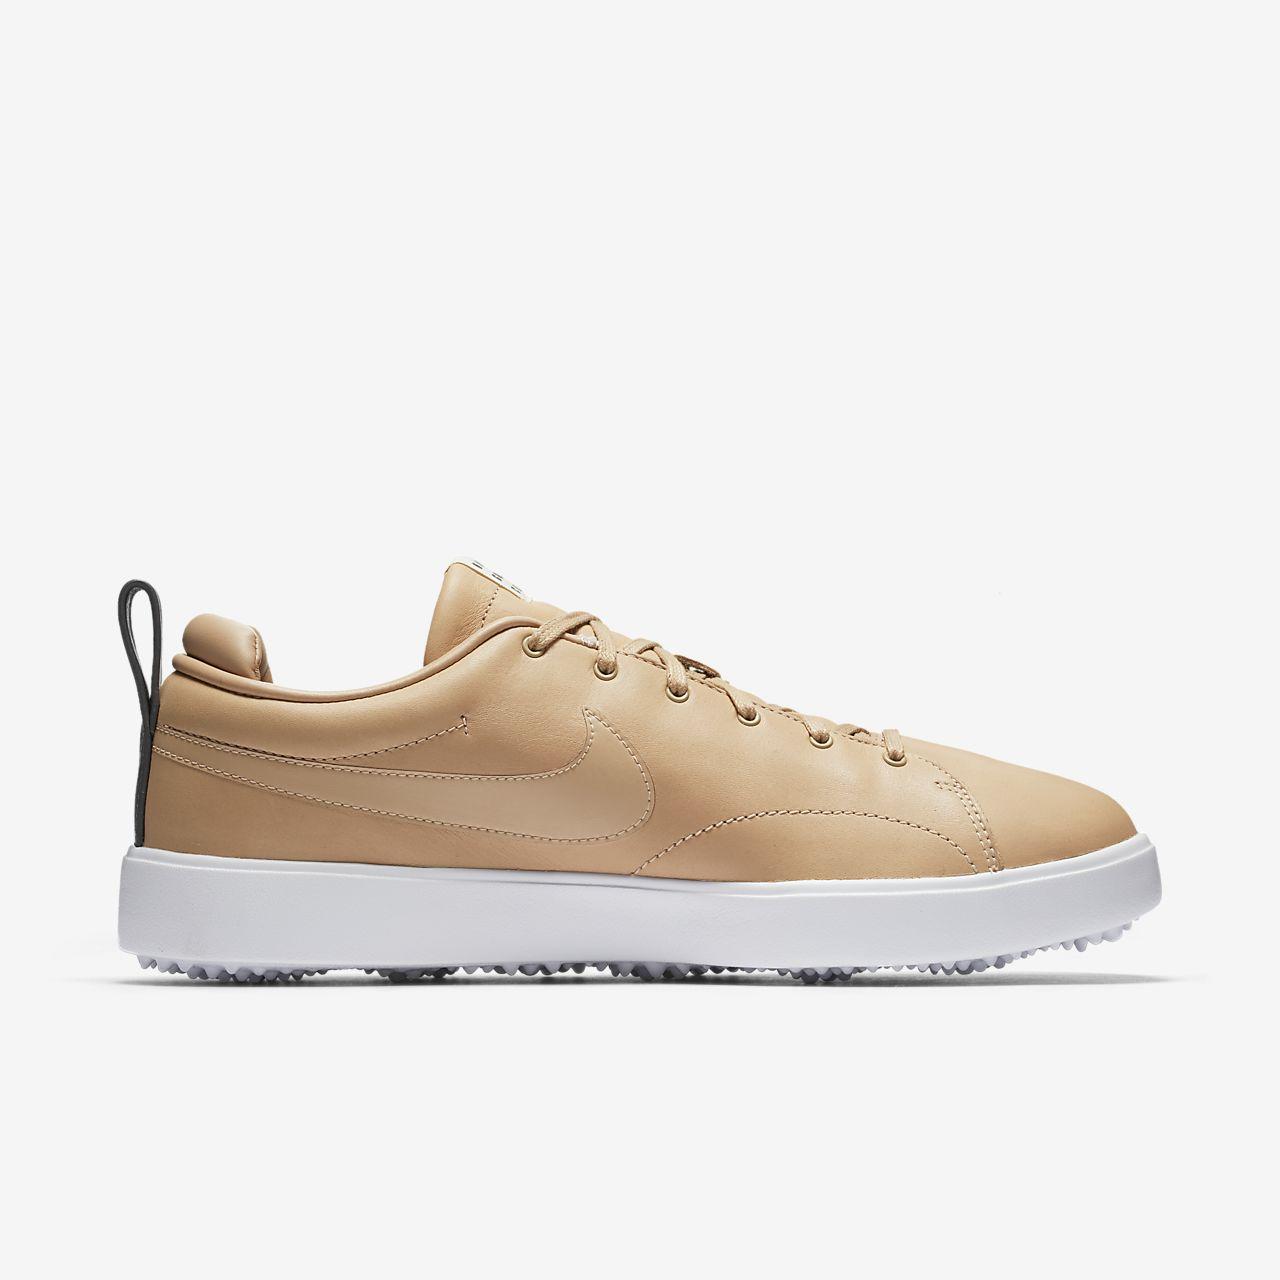 Nike Course Classic NGC Vachetta Tan White Black Vachetta Tan 904583 200